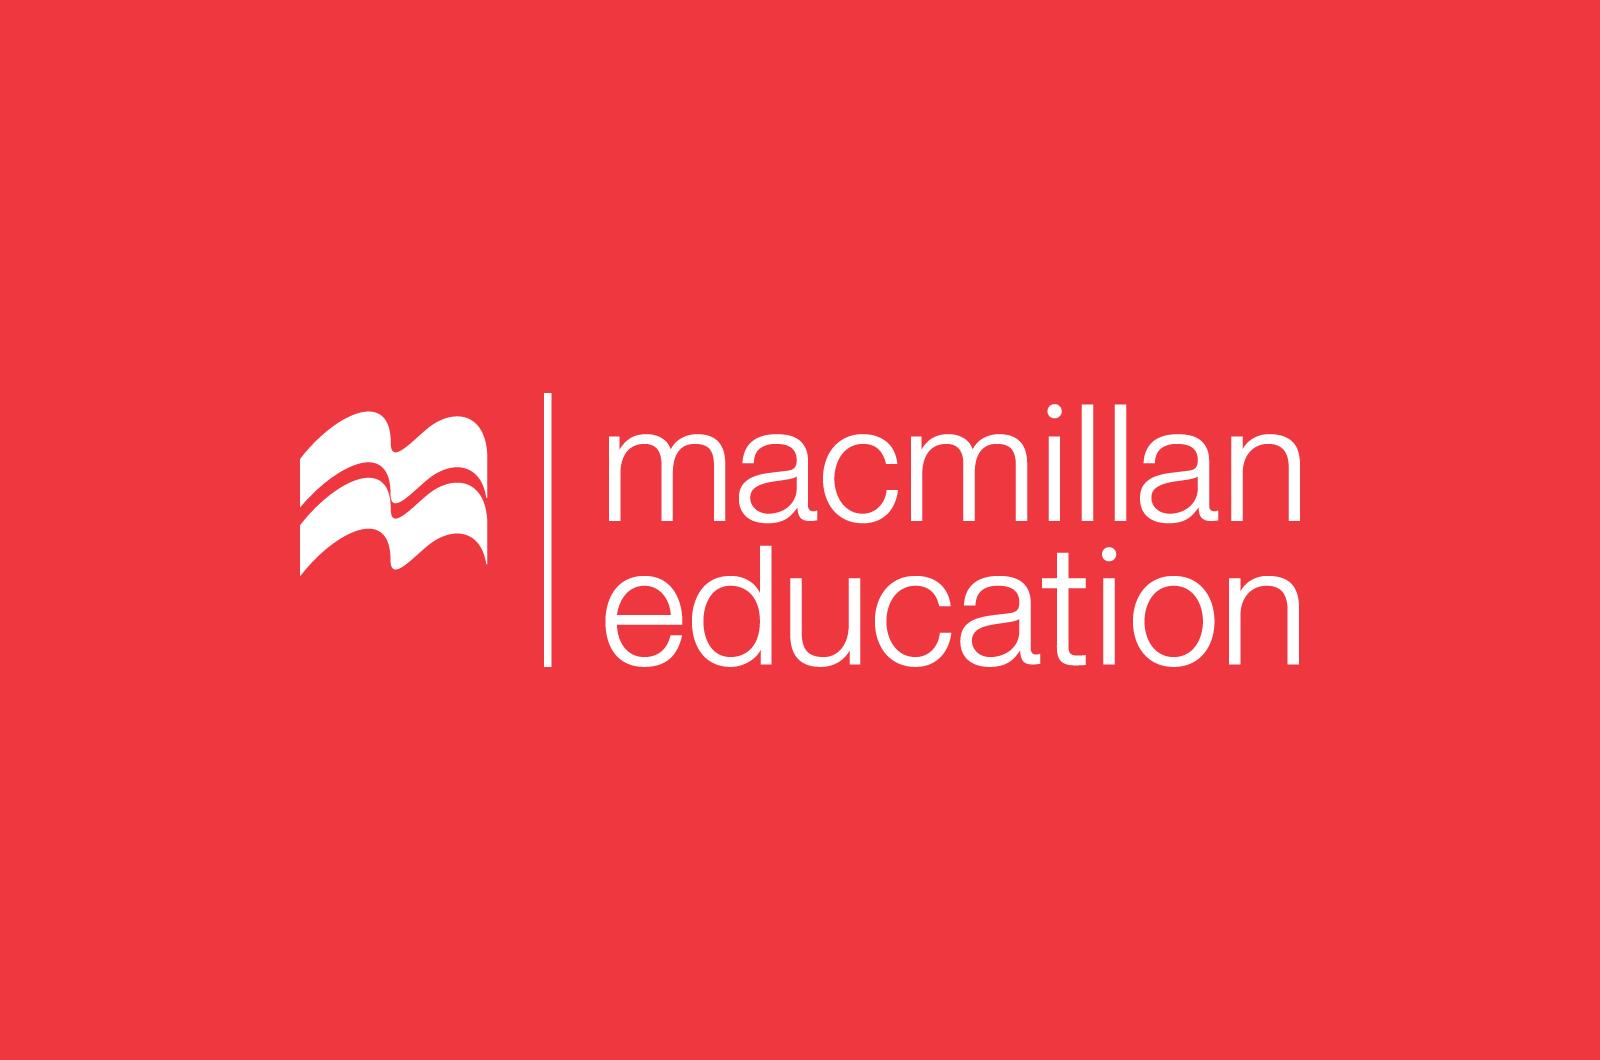 Macmillan logo - standard